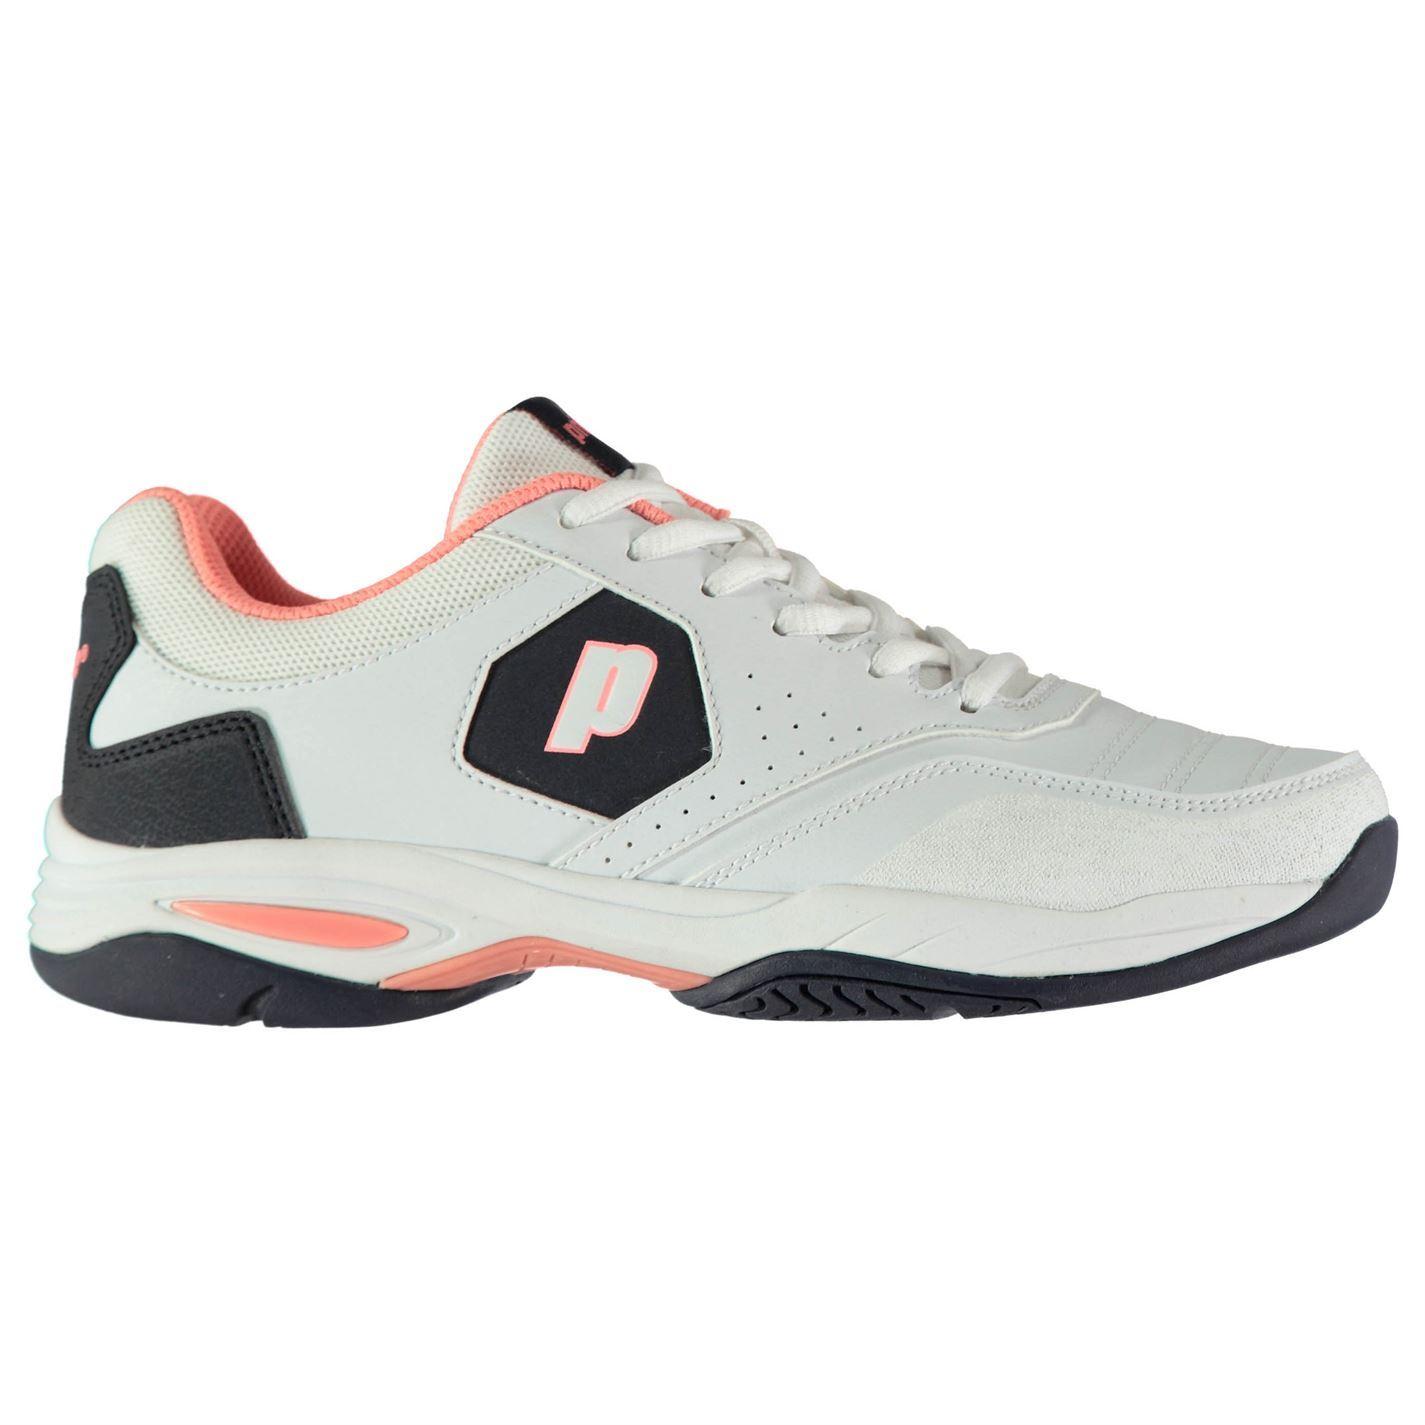 Prince Reflex Tennis Shoes Womens White